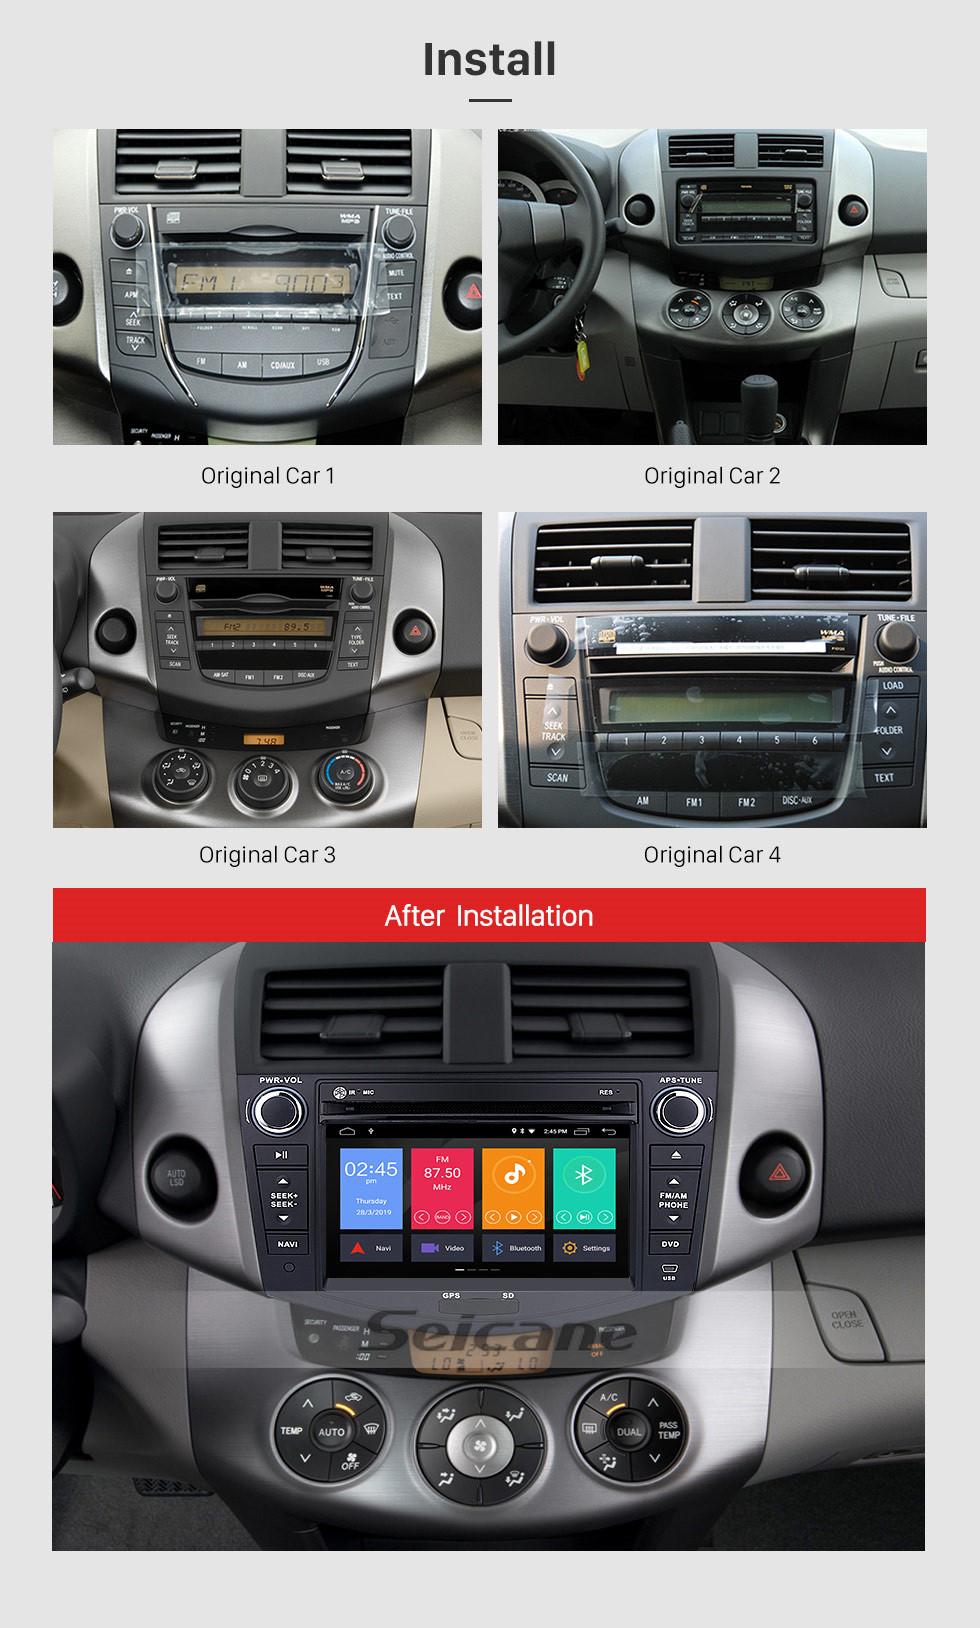 Seicane Android 10.0 2006-2012 Toyota Rav4 Radio DVD Audio 3D GPS System TV Tuner WiFi 3G Bluetooth Steering Wheel Control DVR AUX HD 1080P Backup Camera